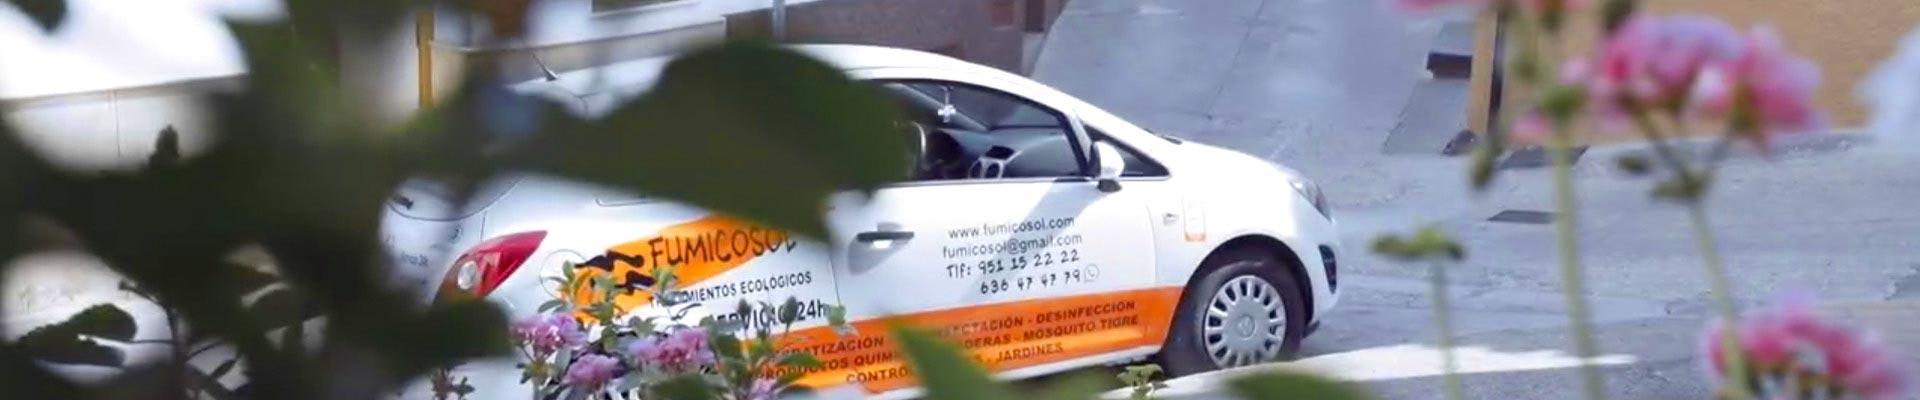 empresa de control de plagas en malaga